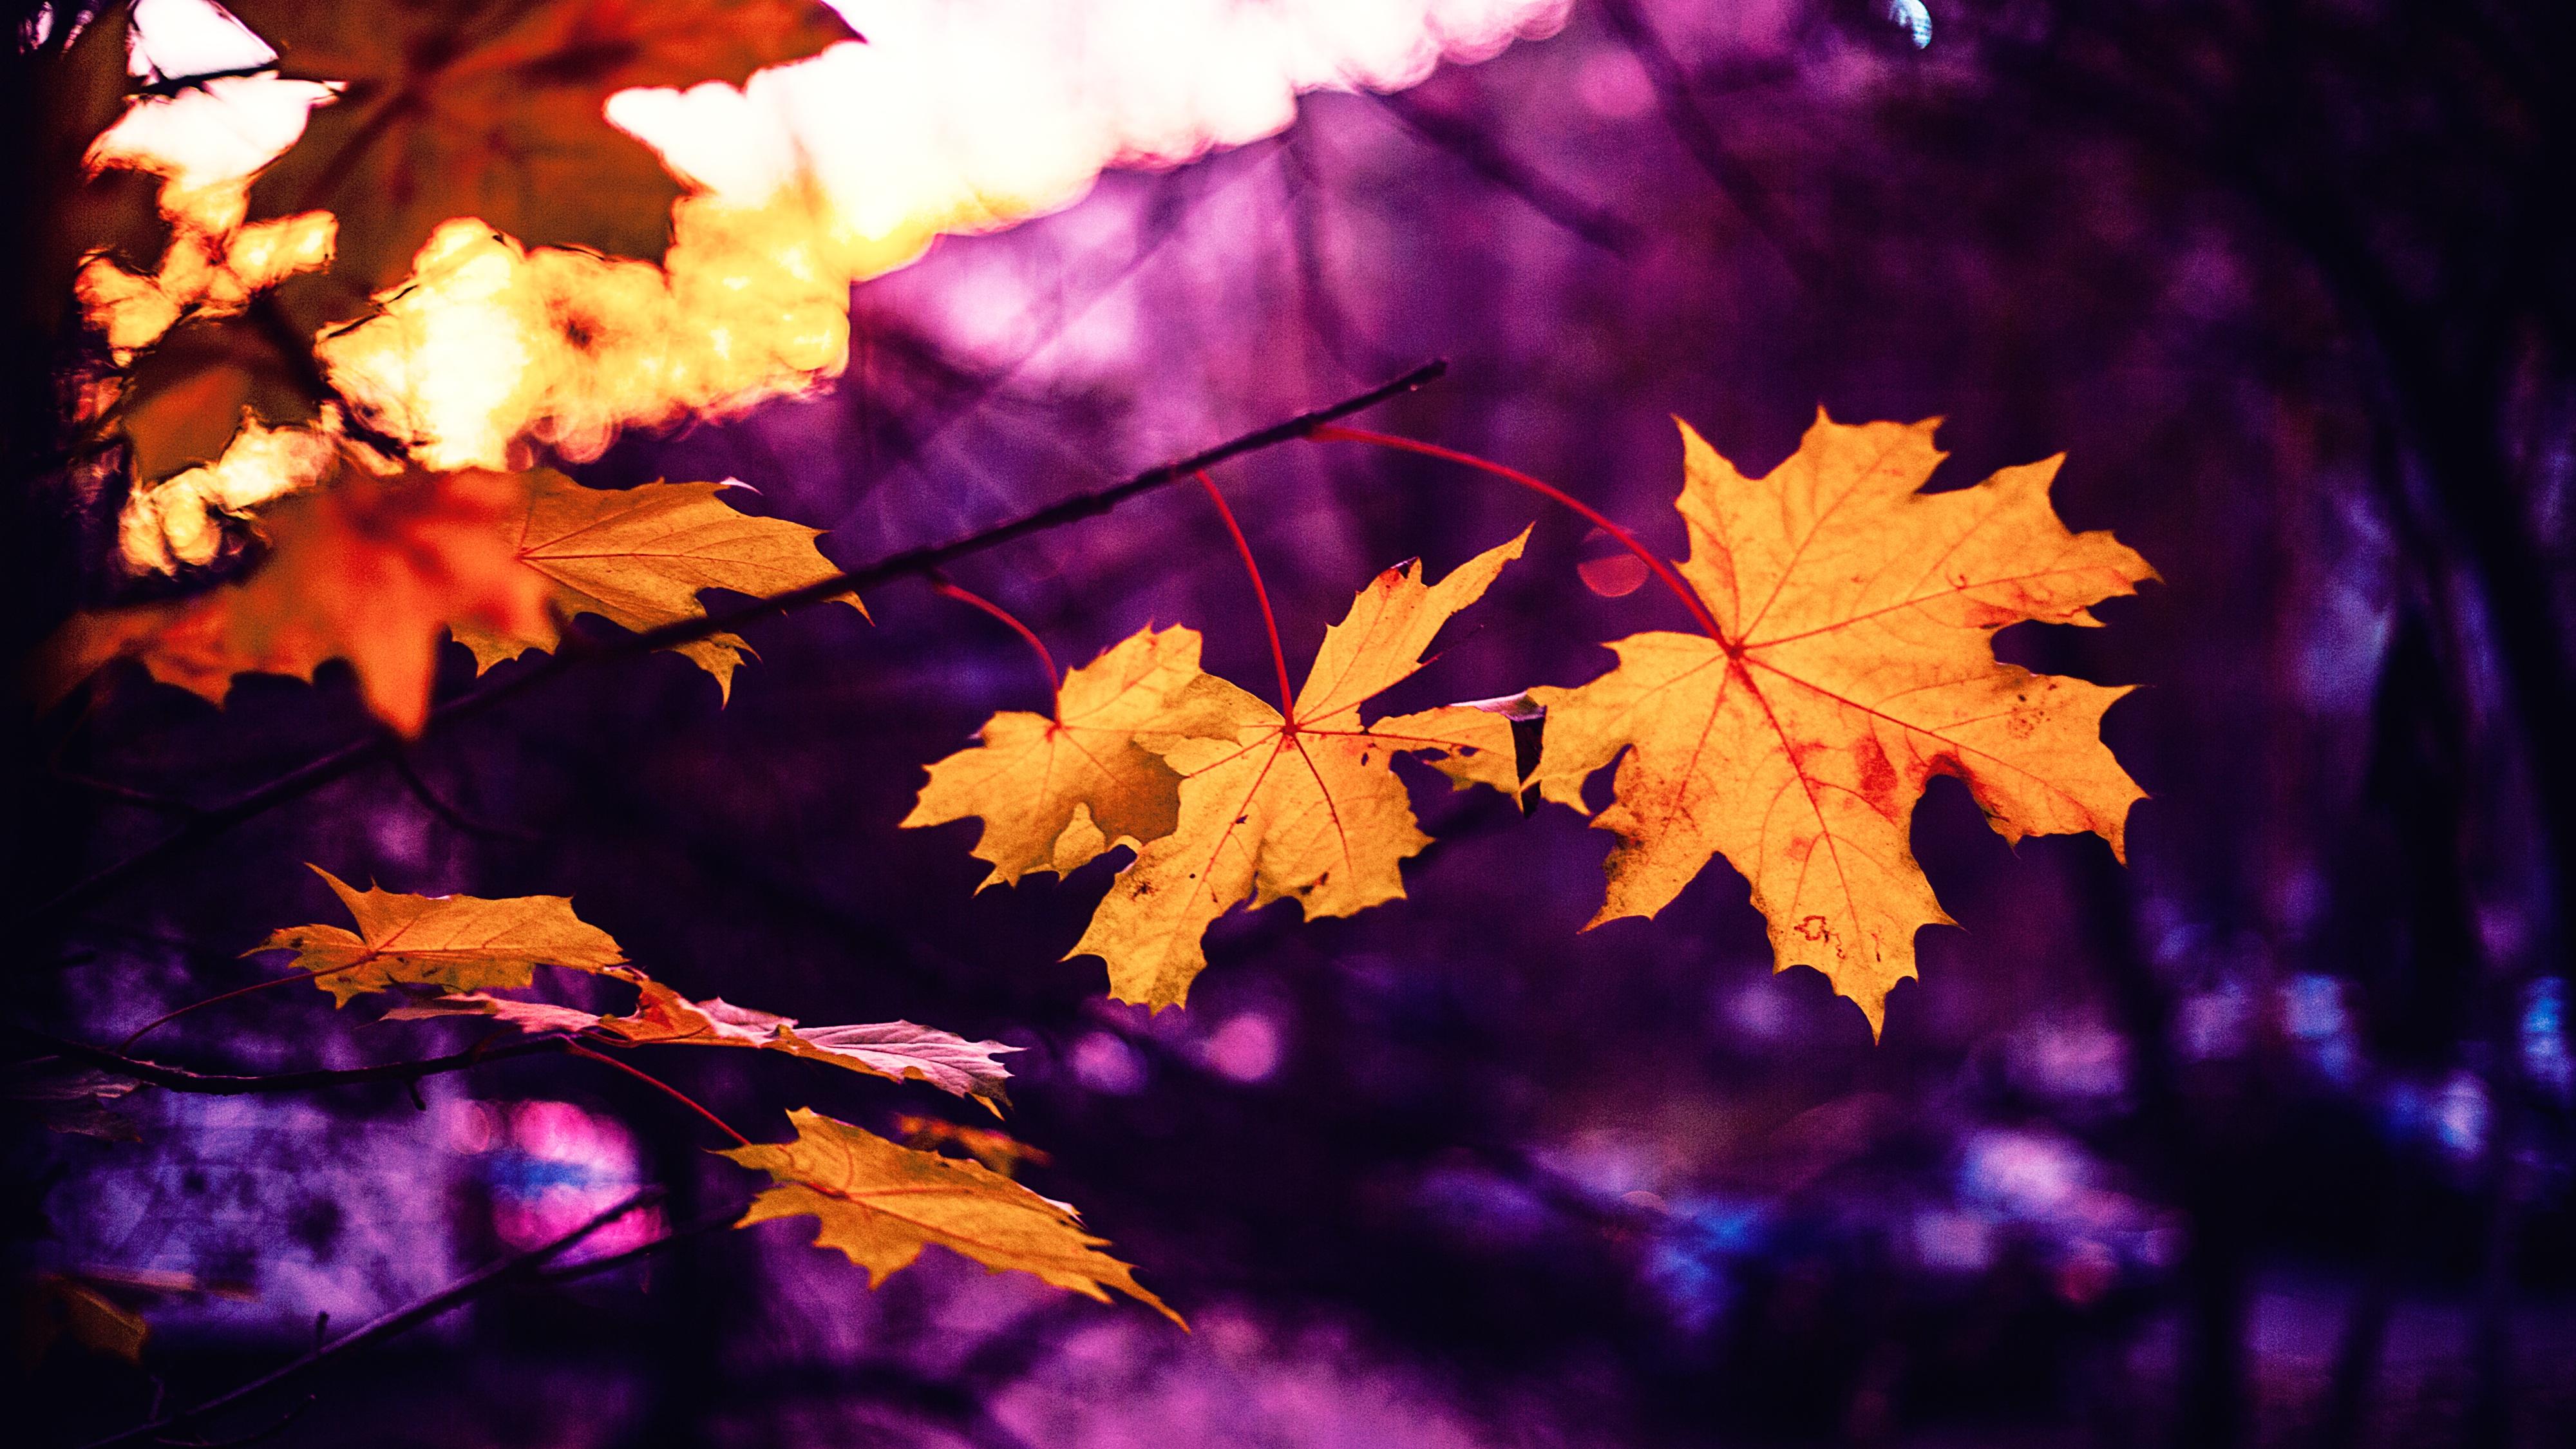 Beautiful Fall Wallpapers Free Stock Photo Of Autumn Autumn Leaf Autumn Leaves